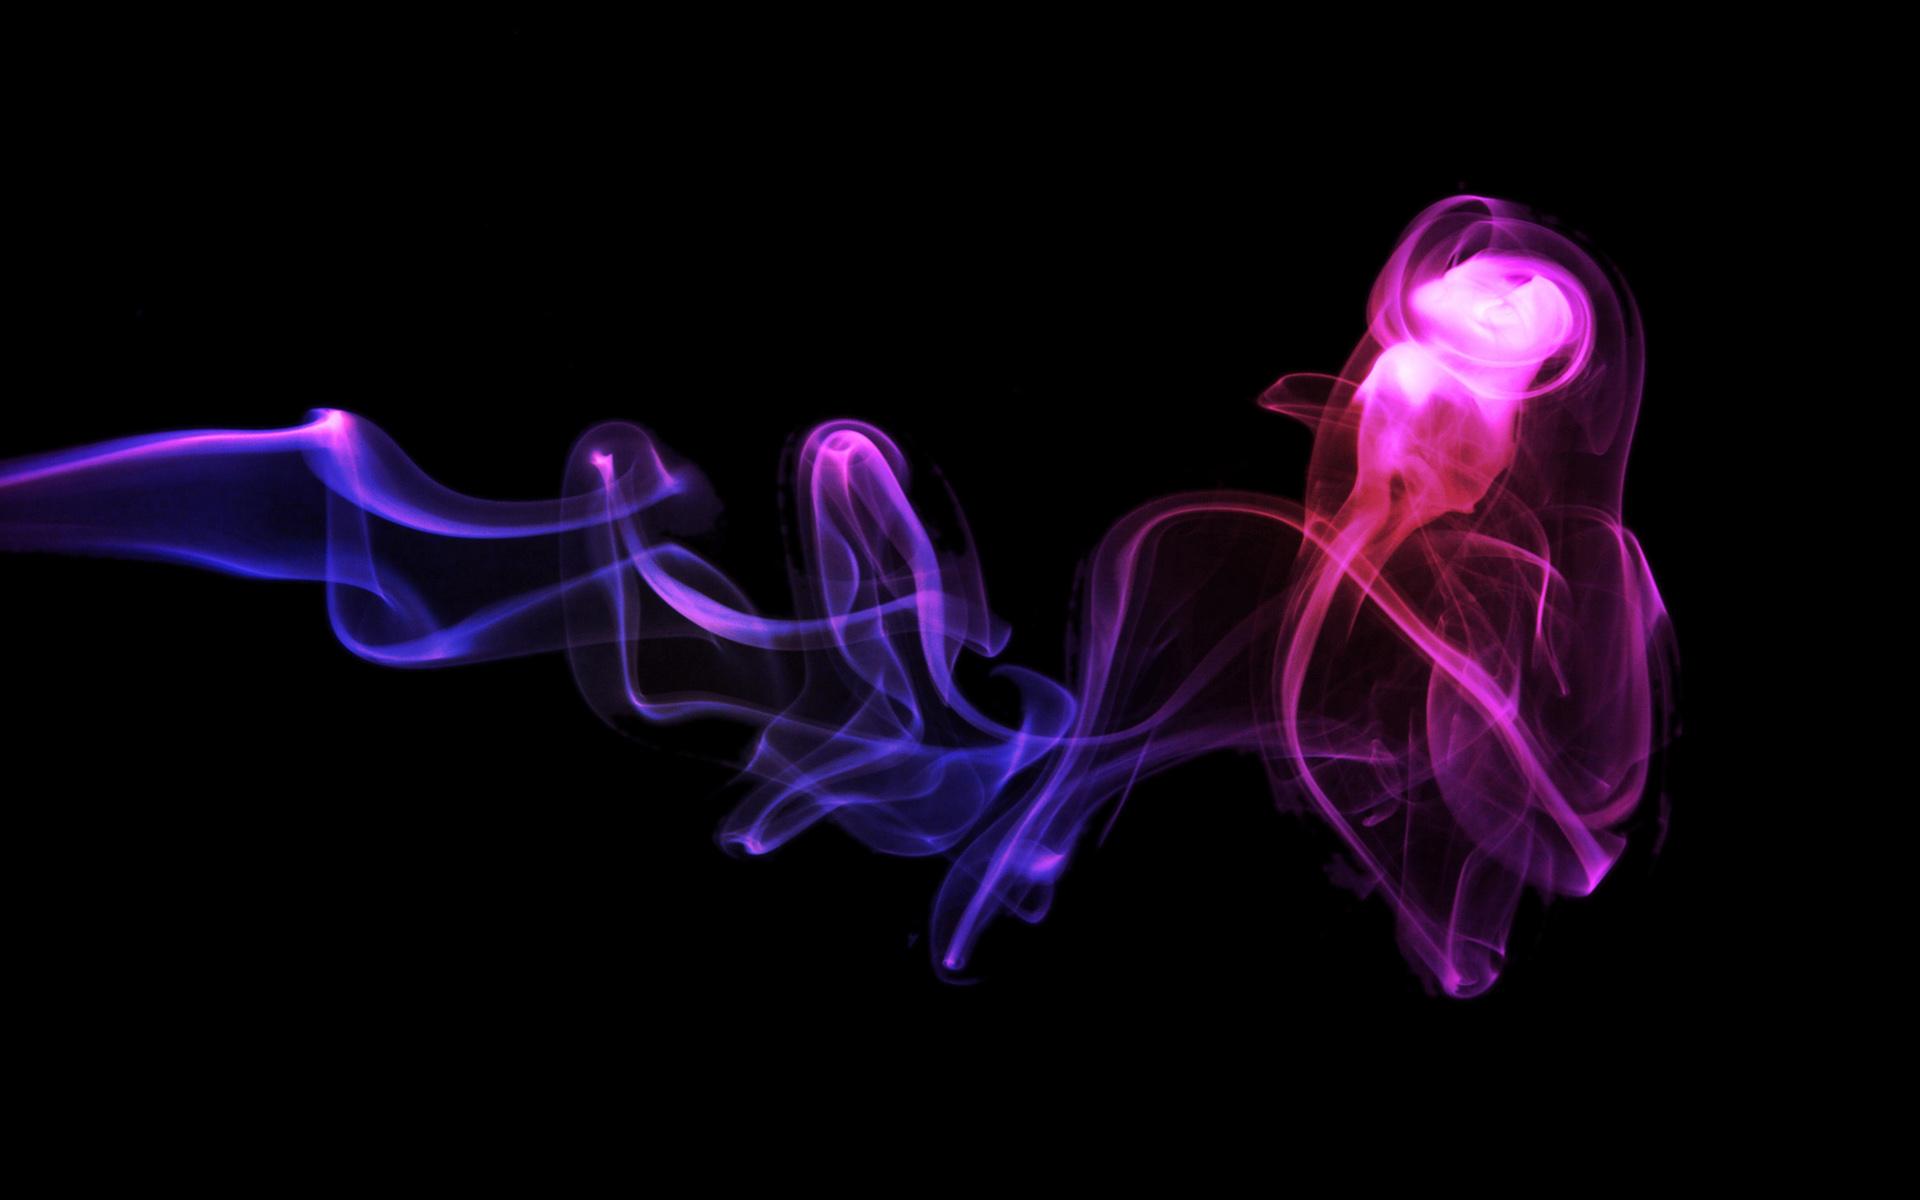 smoke wallpapers 27450